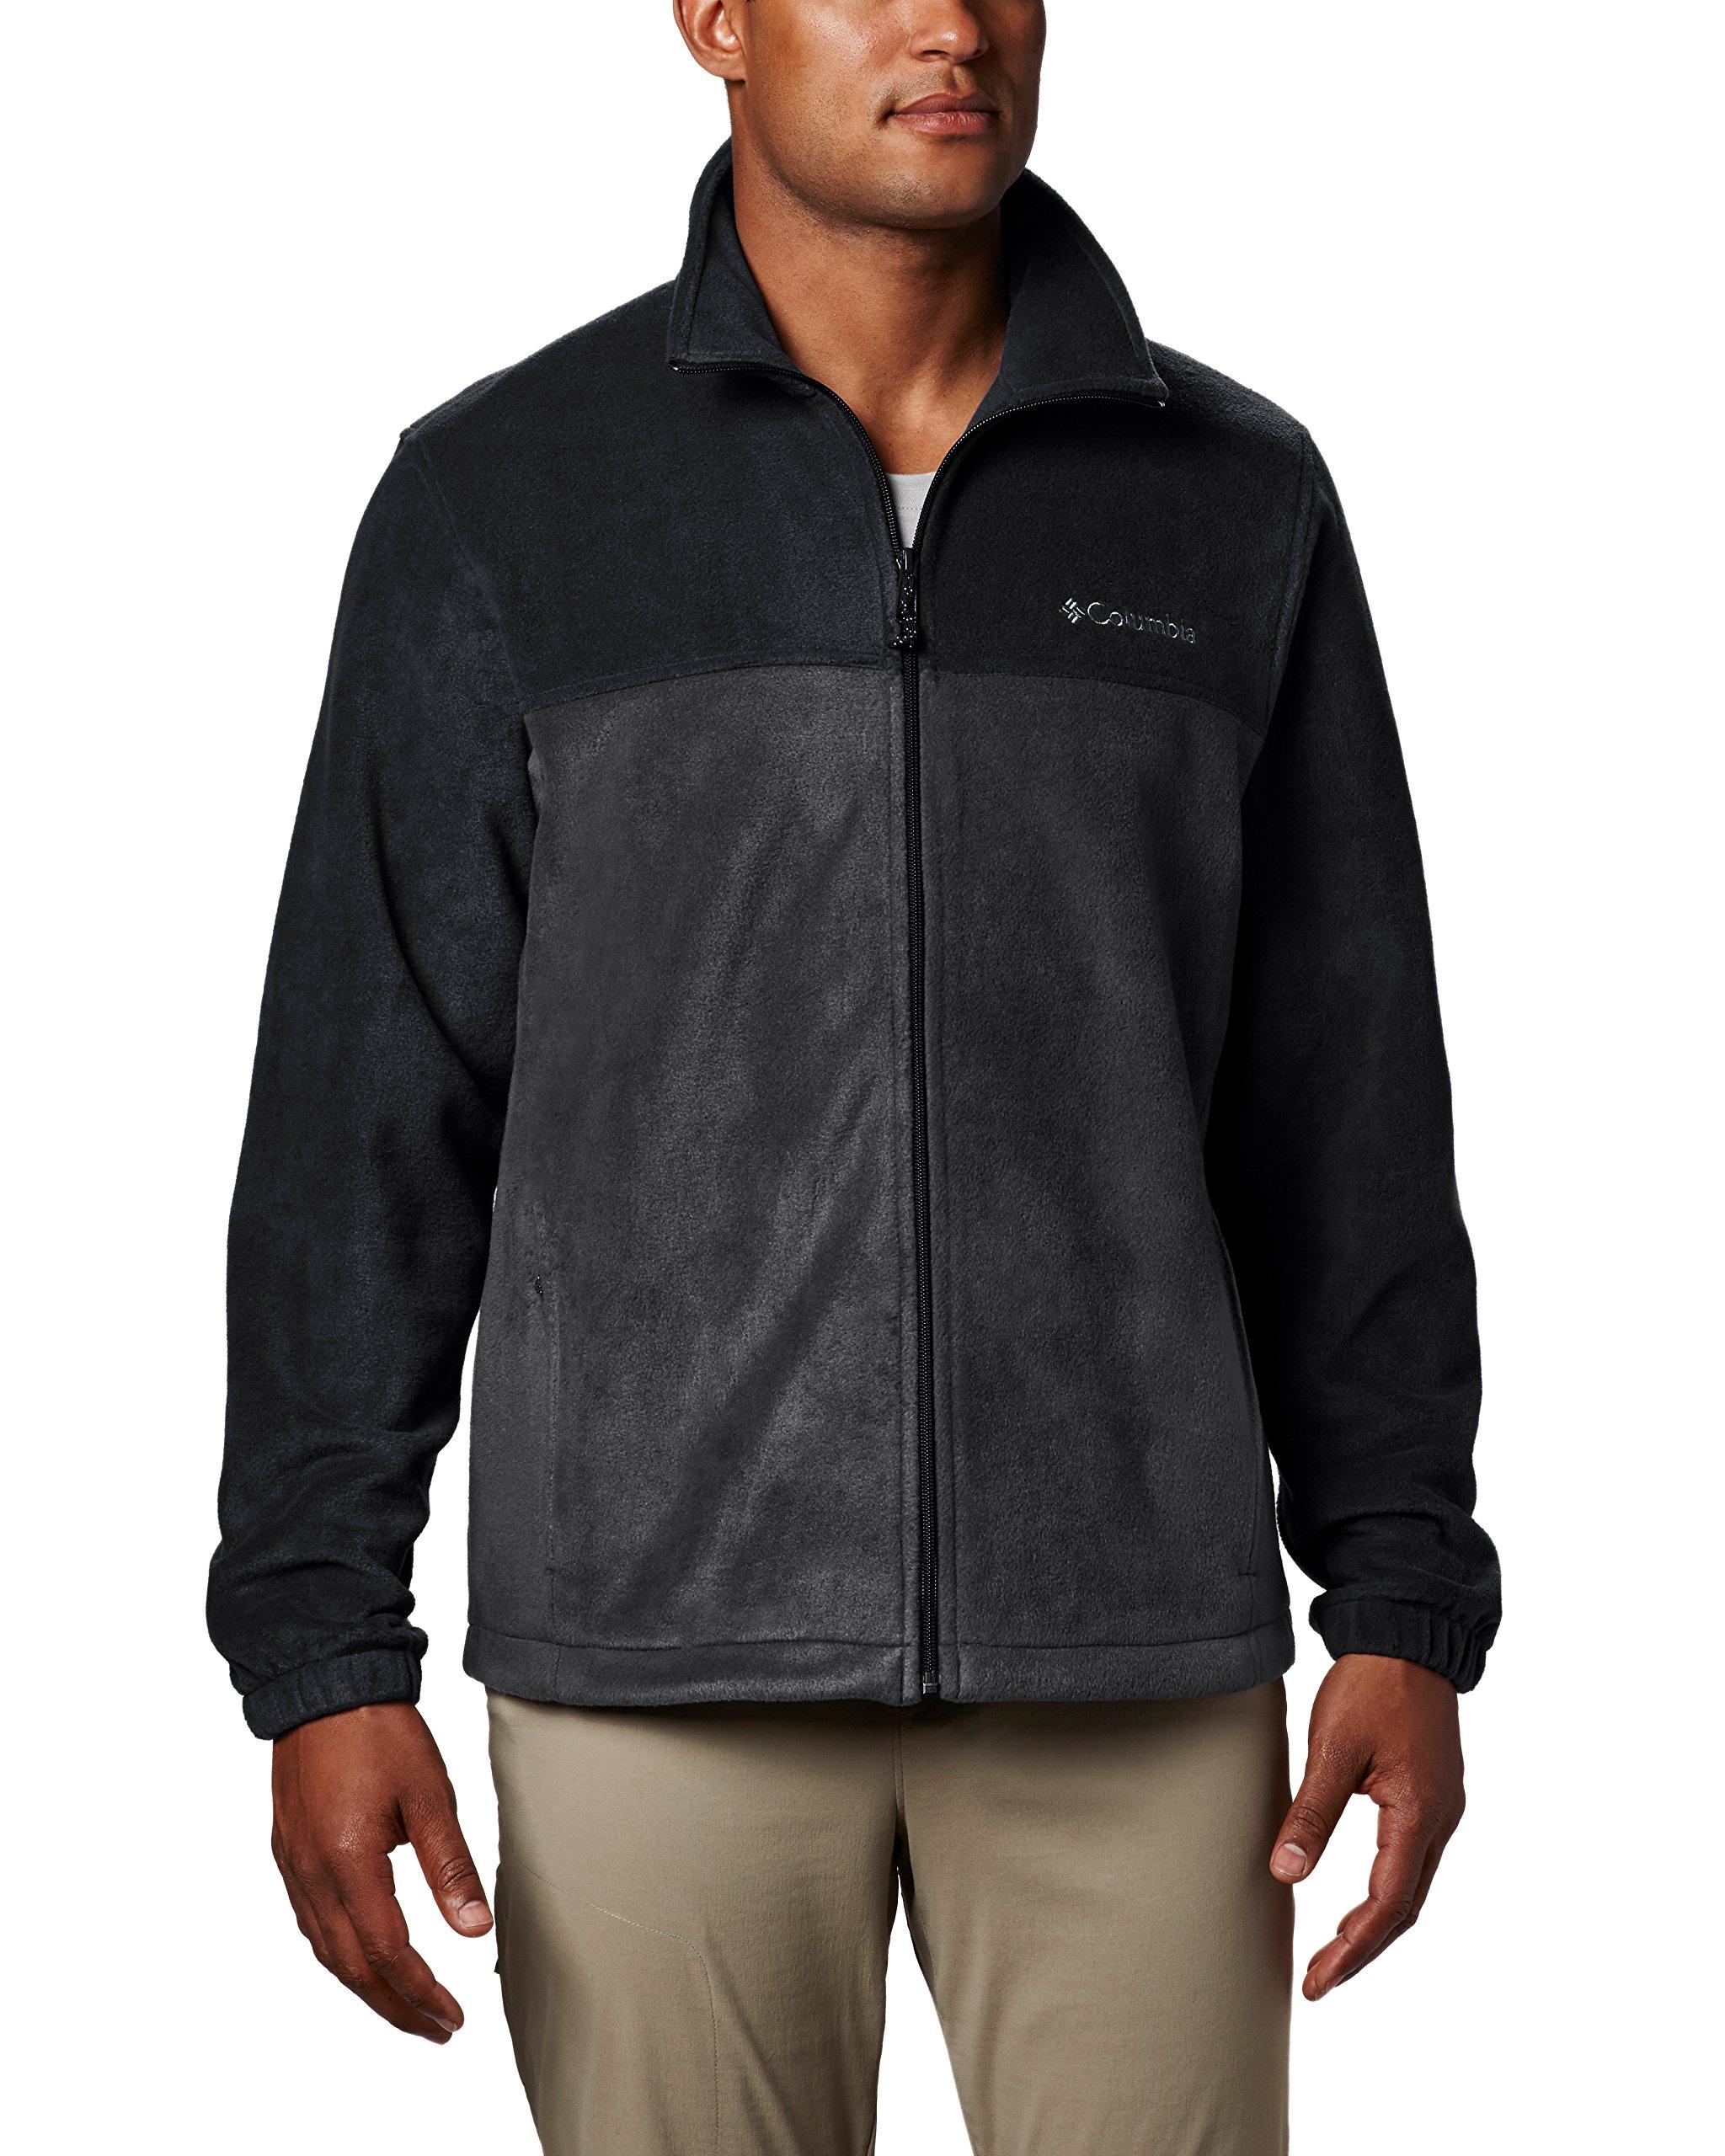 Columbia Men's Steens Mountain Full Zip 2.0 Soft Fleece Jacket, Black/Grill, XX-Large